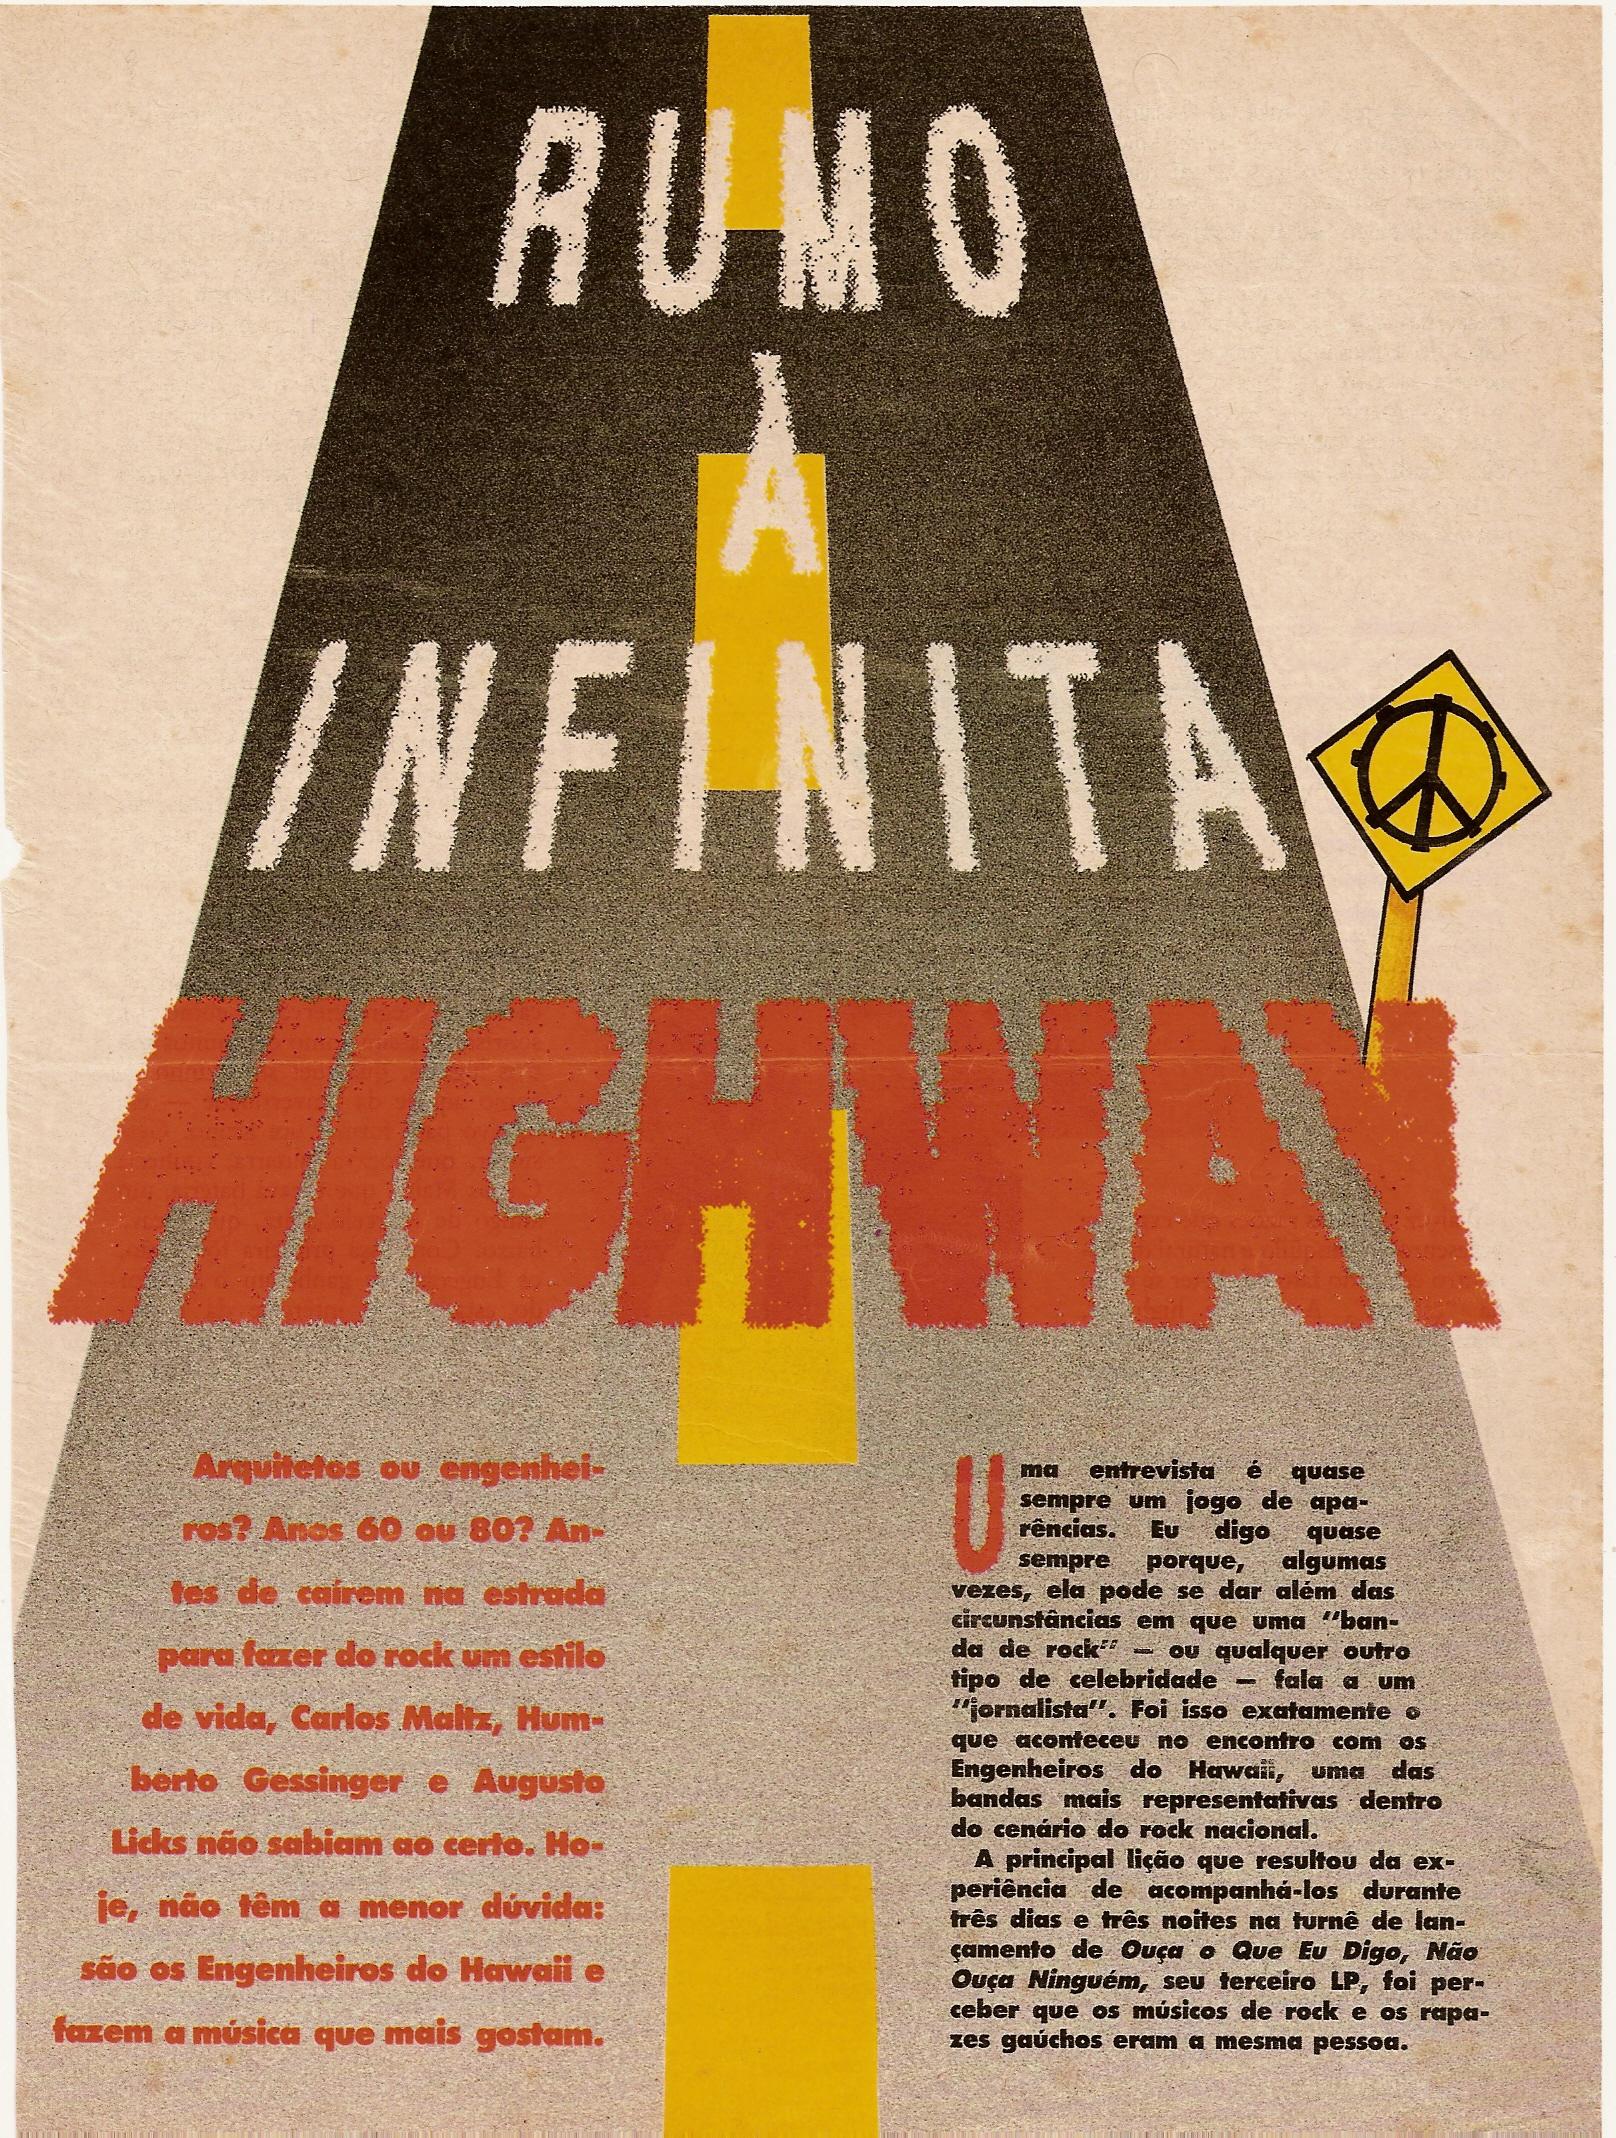 1988 Engenheiros Do Hawaii Rumo à Infinita Highway Tato Coutinho